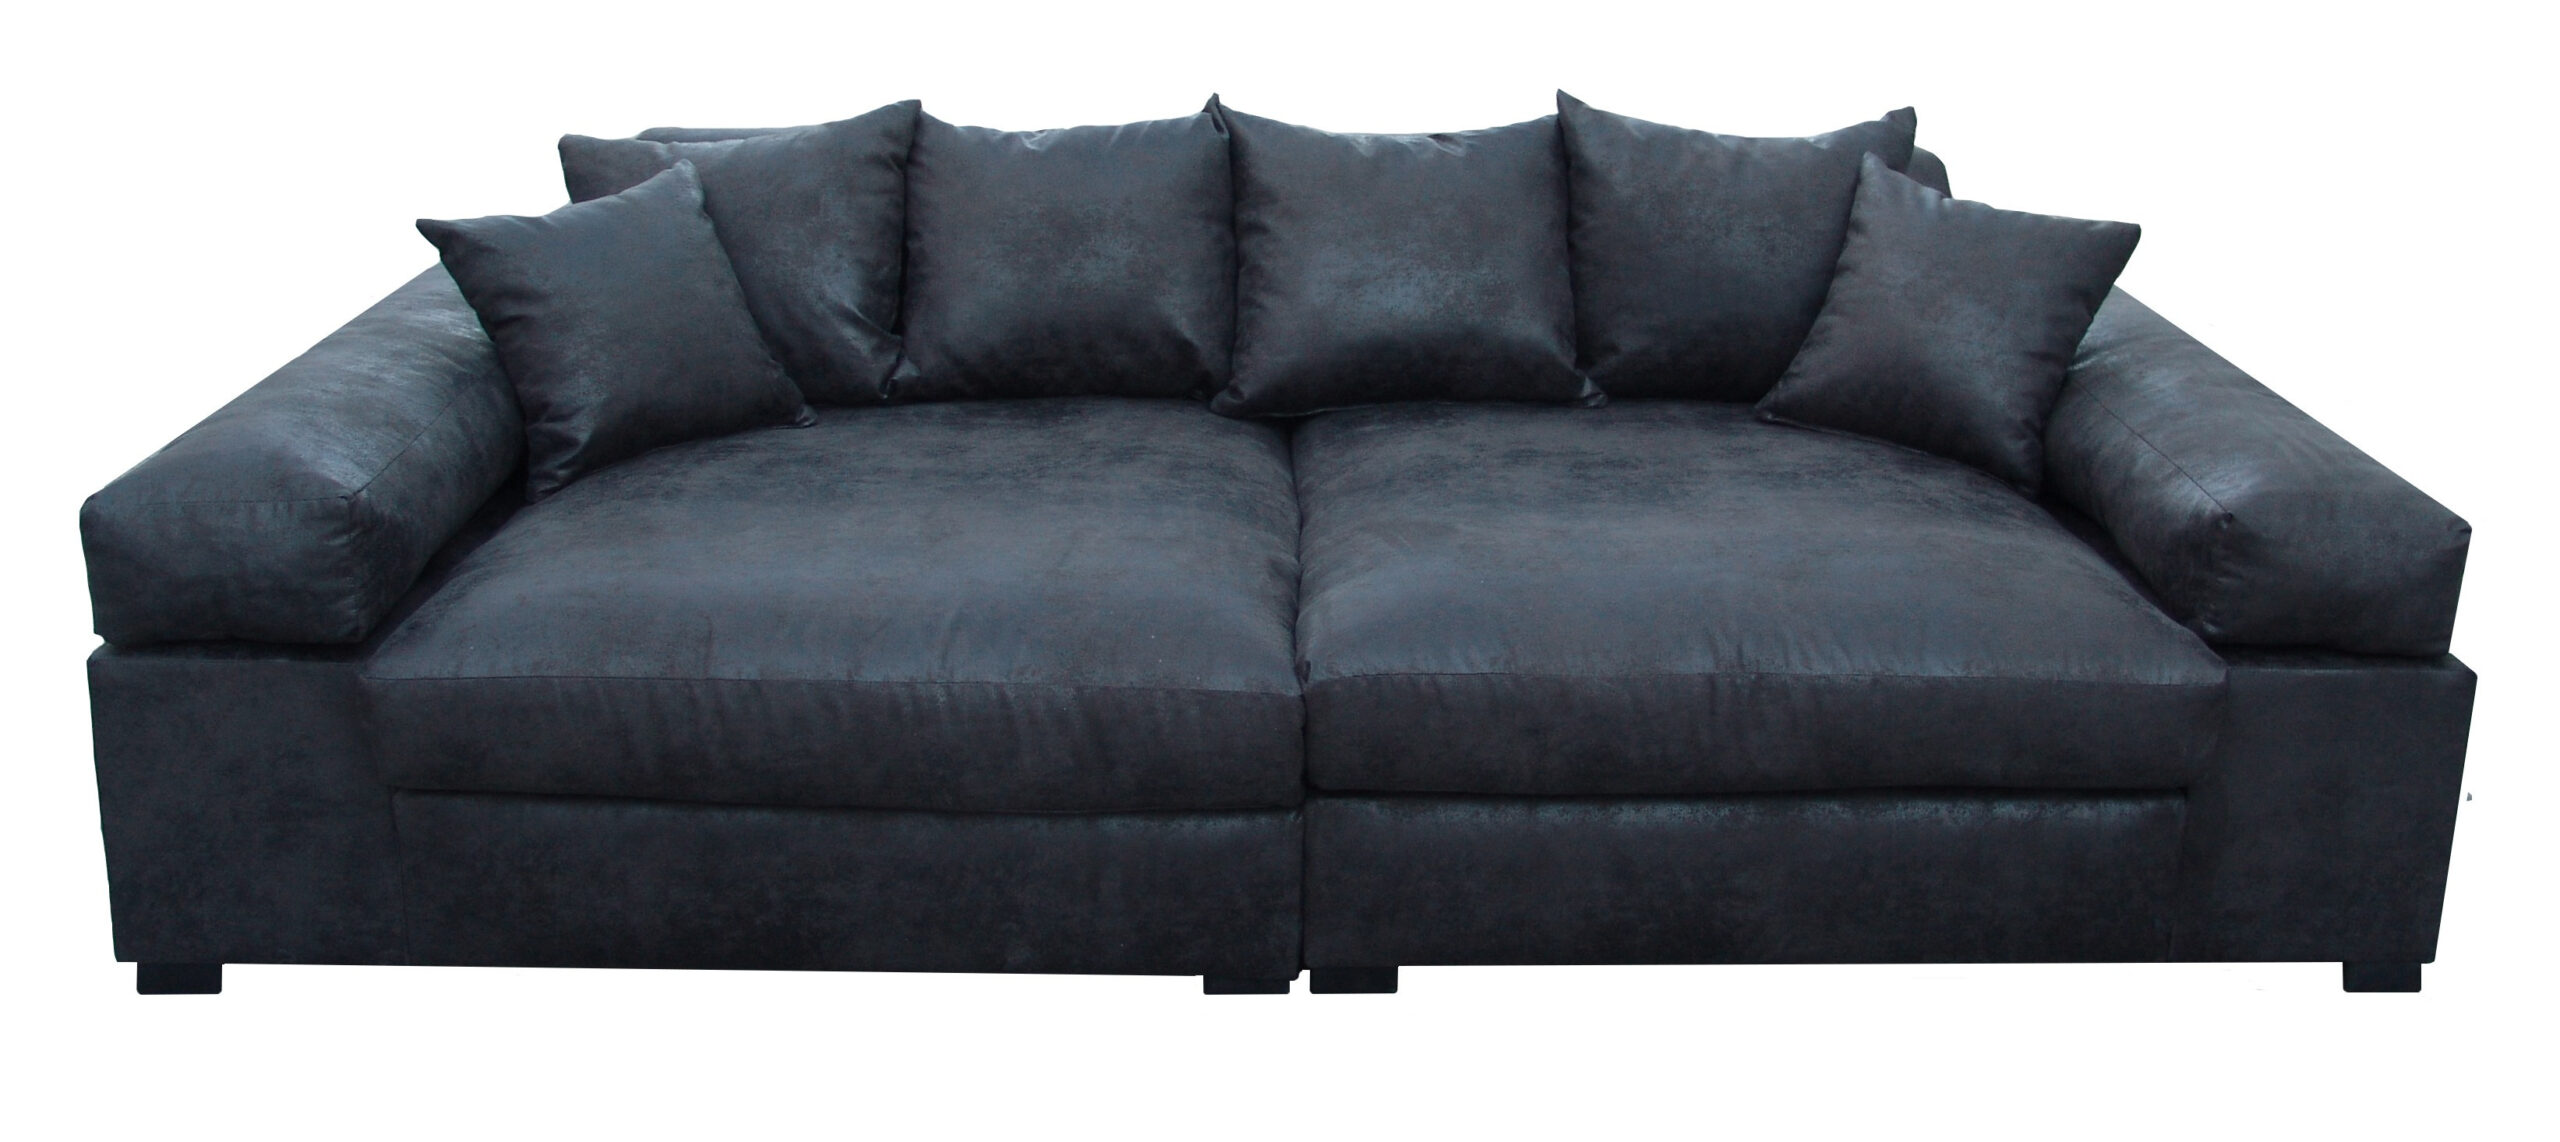 Full Size of Big Sofa Leder 3 Sitzer Vintagelederoptik Schwarz Vancover 9855 Ra Polyrattan 2 5 Mit Recamiere Home Affair Holzfüßen Weiß Grau Relaxfunktion Grün Leinen Sofa Big Sofa Leder